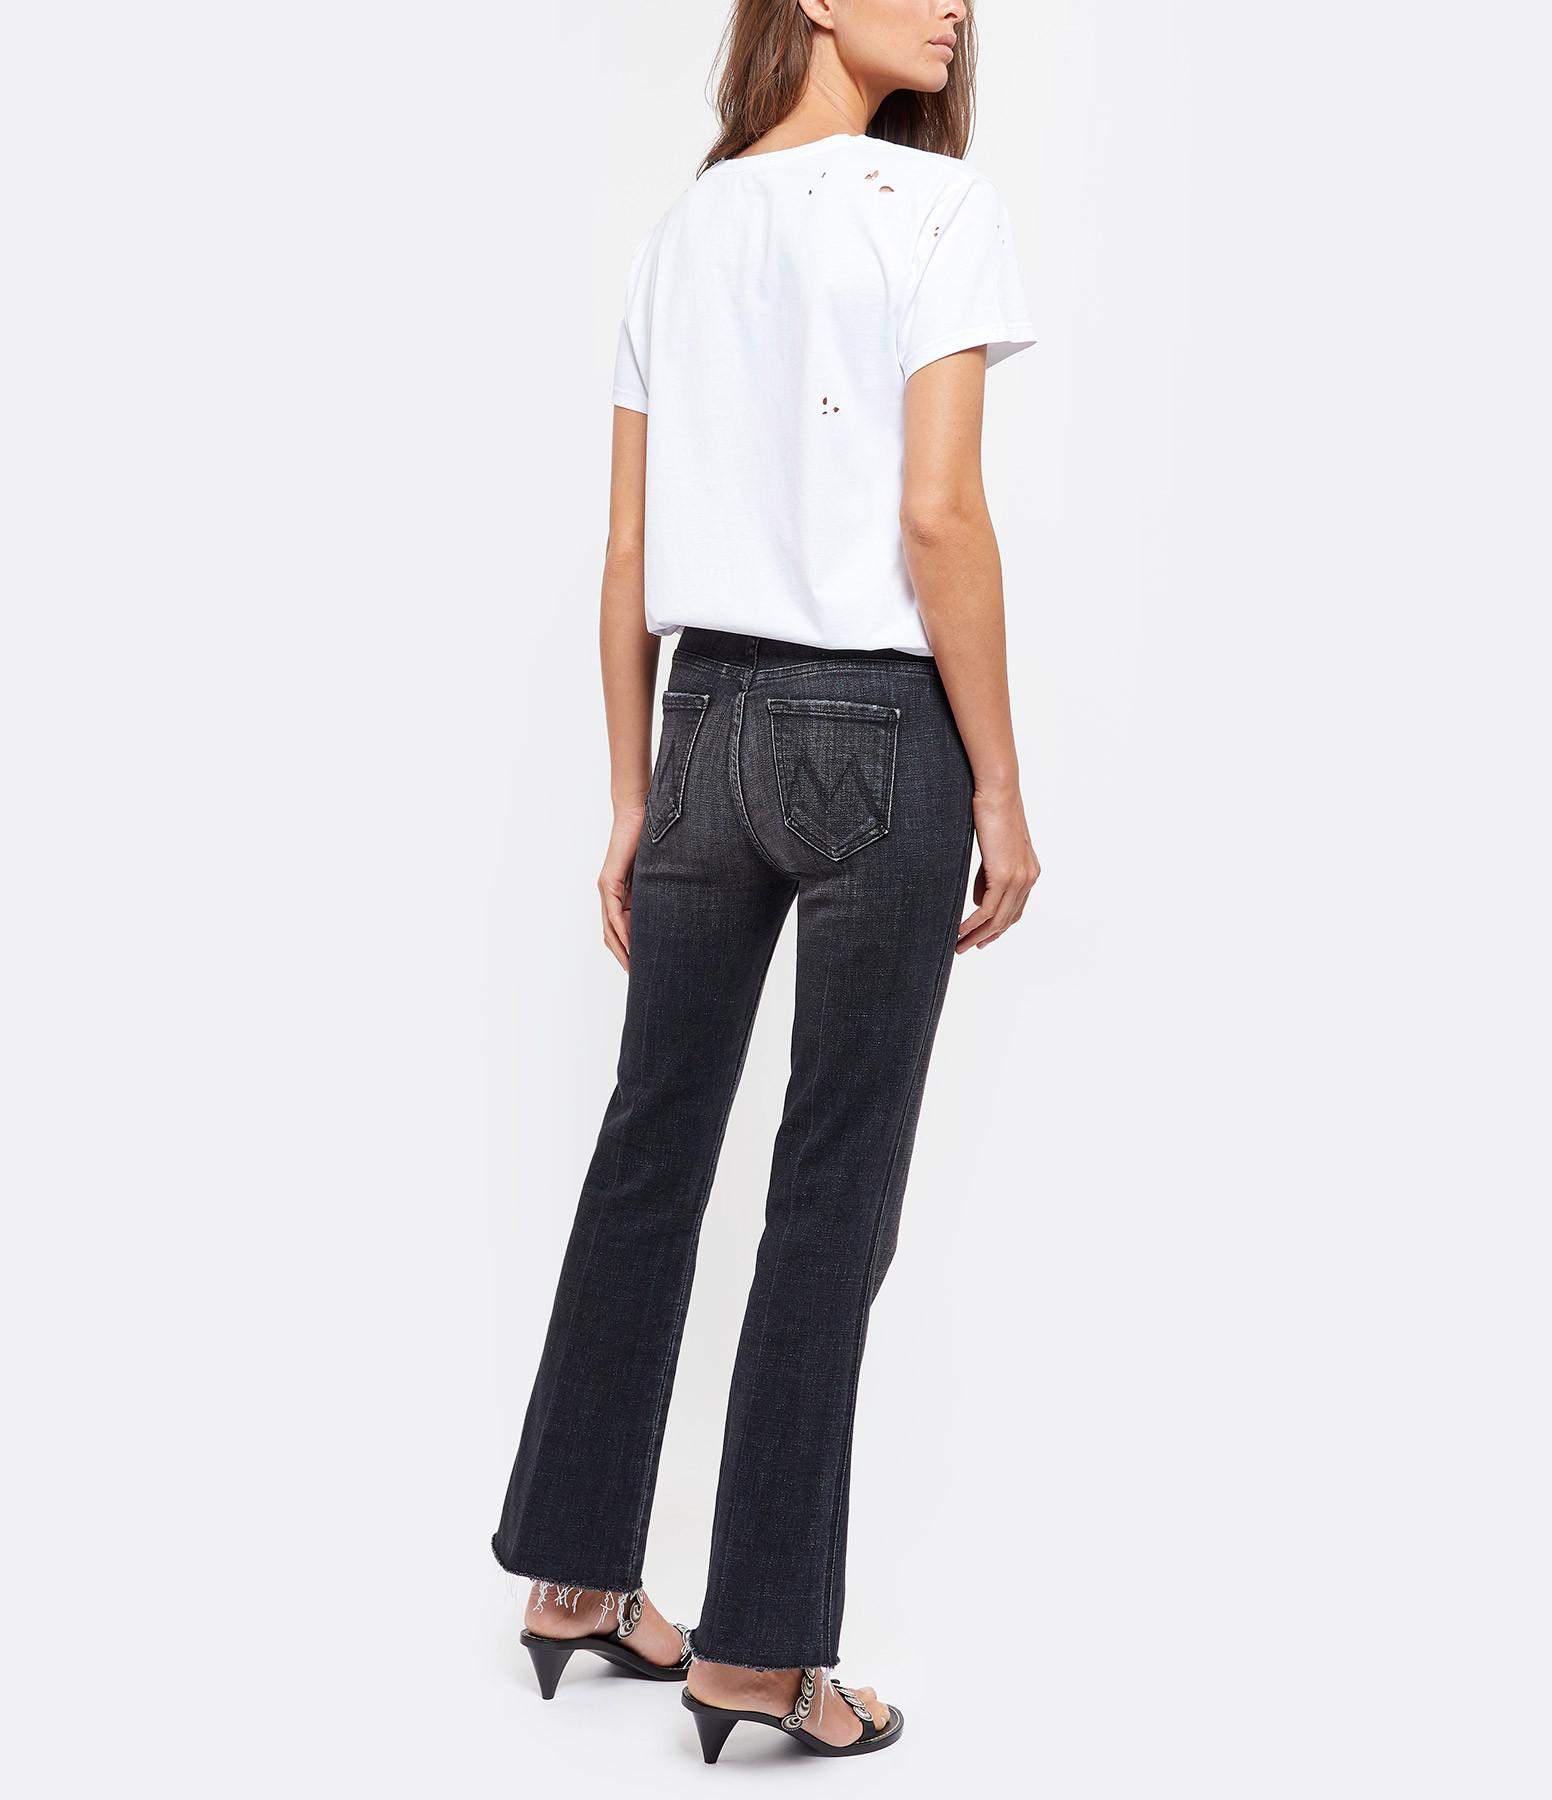 JEANNE VOULAND - Tee-shirt Ermes Destroy Coton Blanc